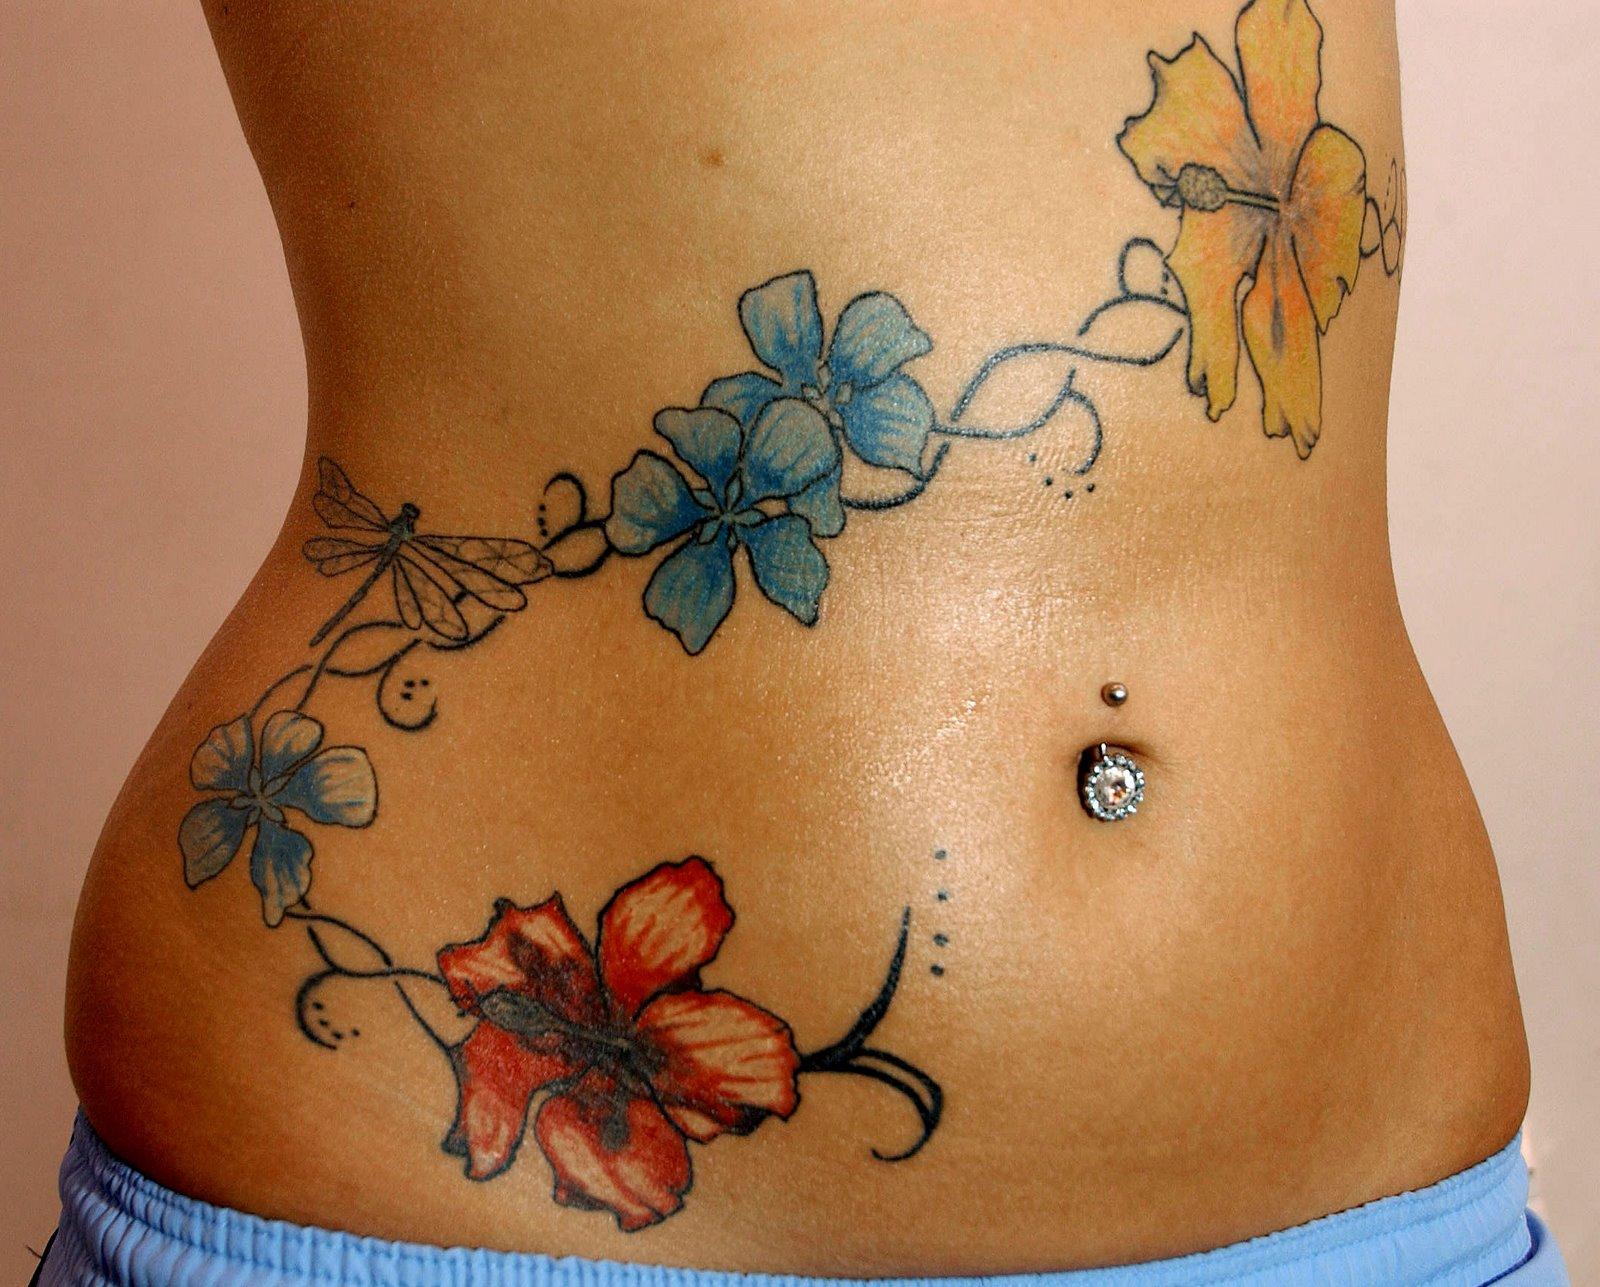 http://2.bp.blogspot.com/_eXB-dCzFSus/TCMy5_6BewI/AAAAAAAAA44/420kvzkLLzk/s1600/Flower+Tattoos1.jpg